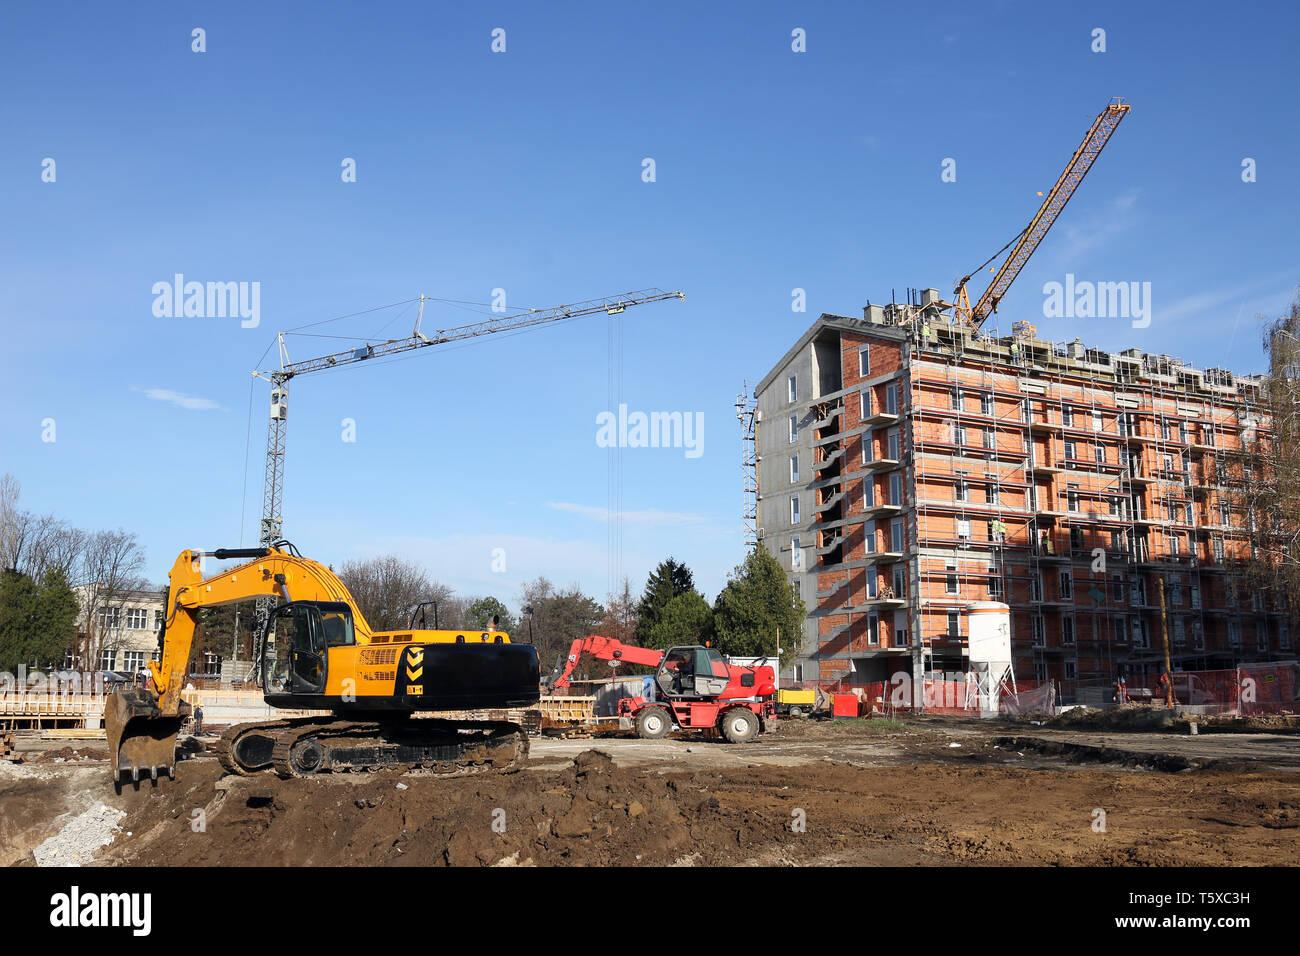 excavators and cranes on construction site - Stock Image